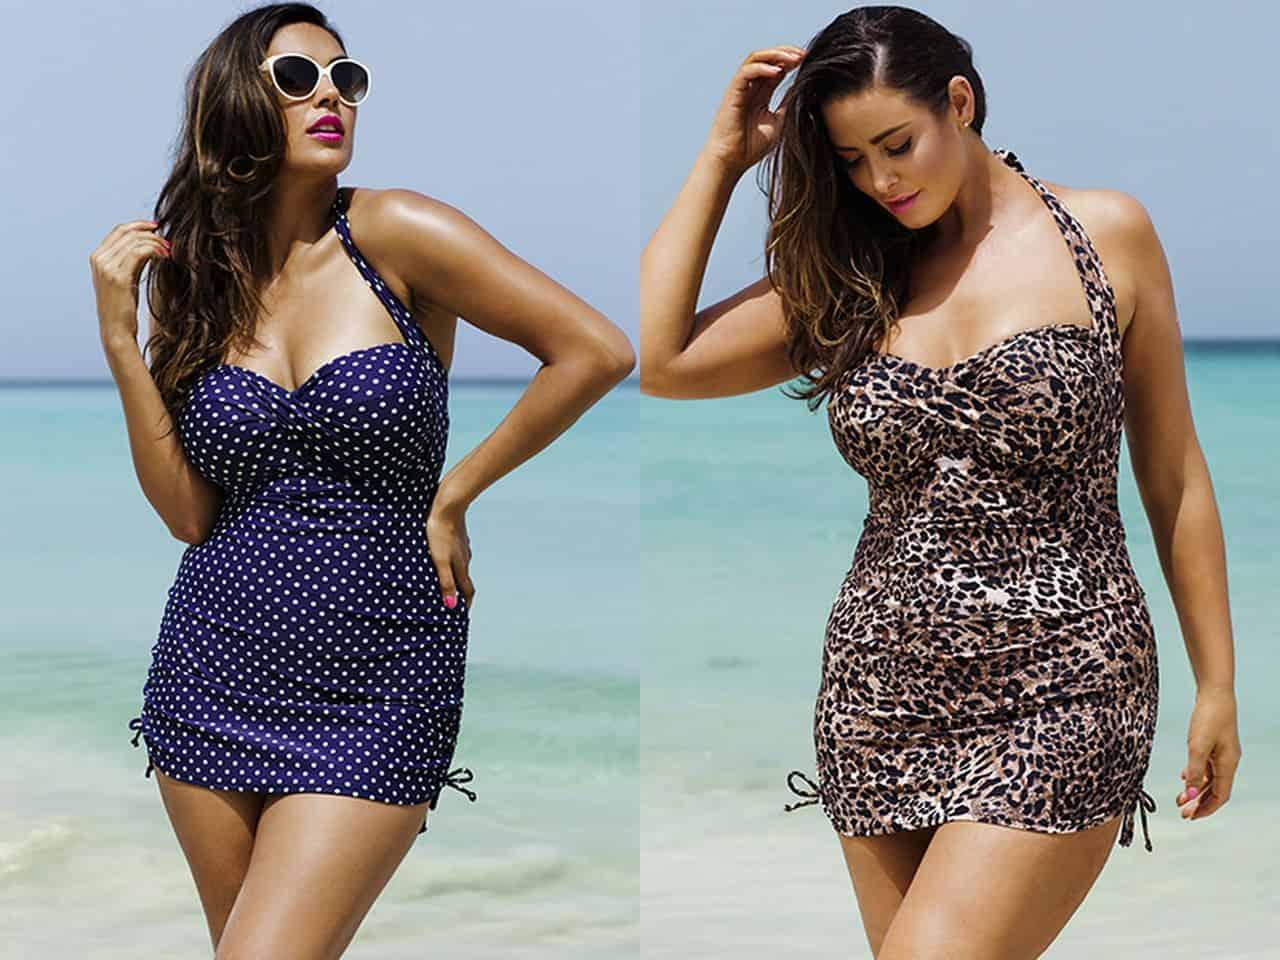 Plus-size-swim-suit-trends-2016-7